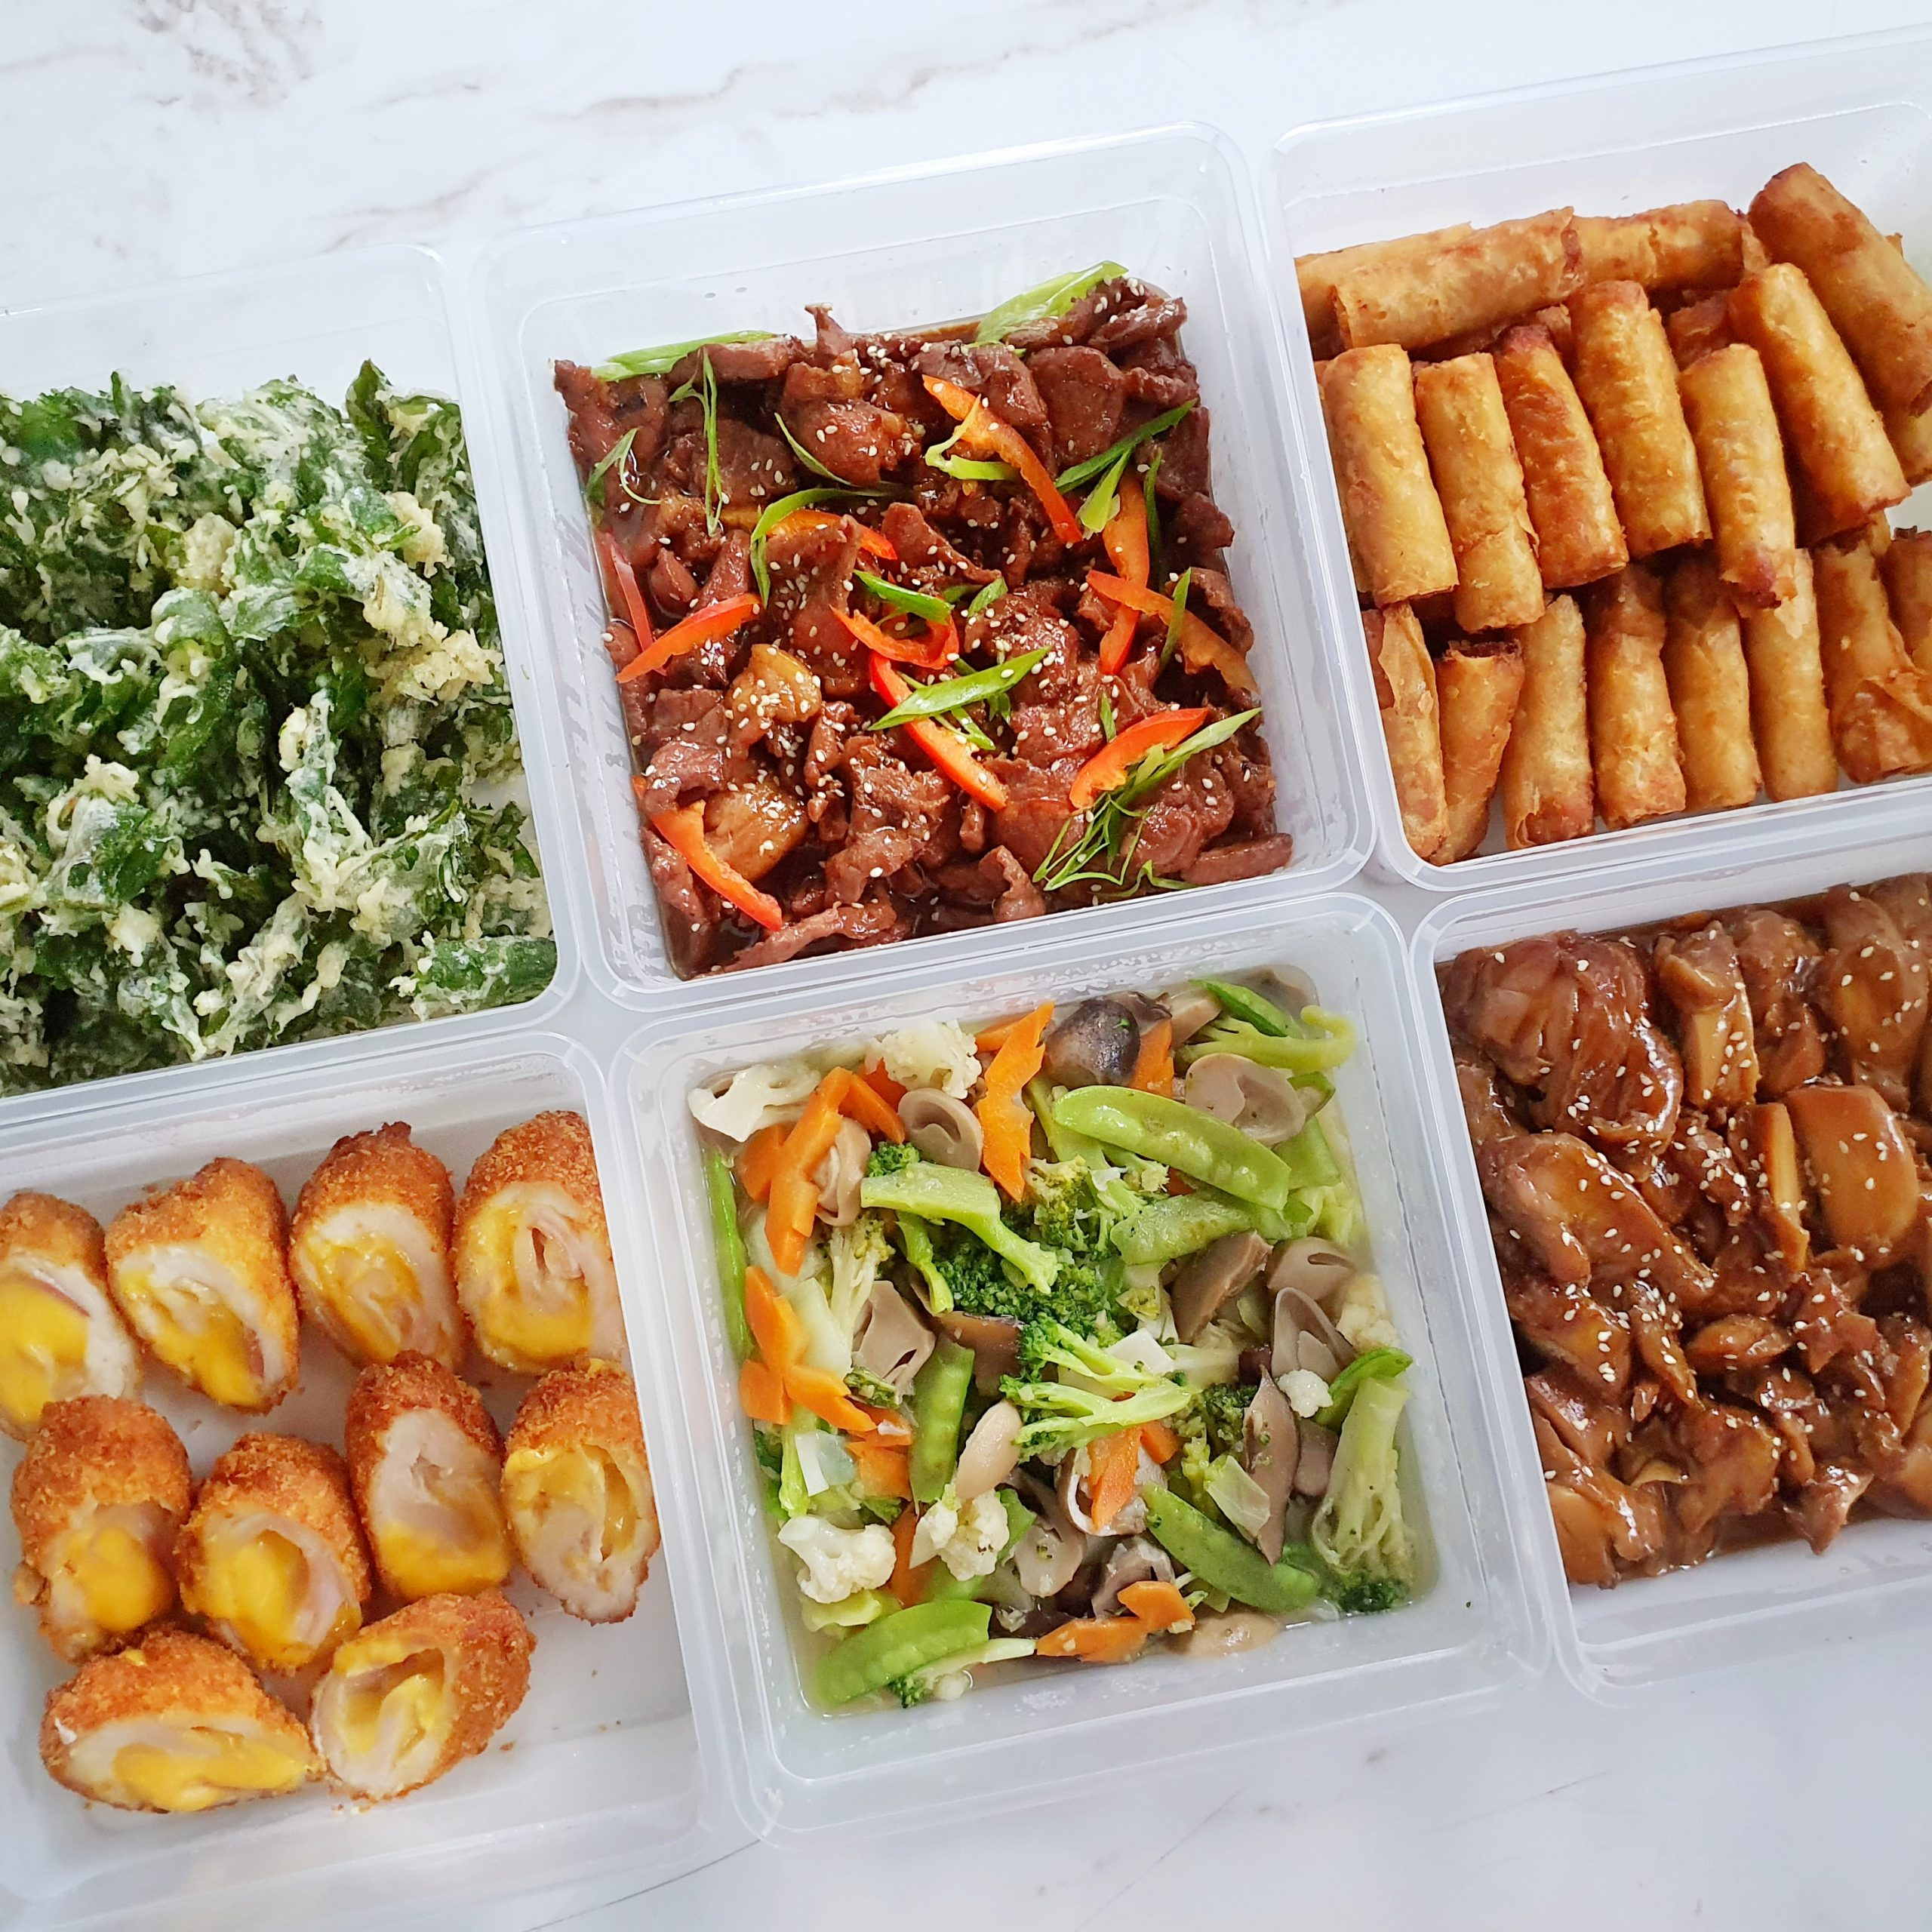 Korean / Japanese Cravings